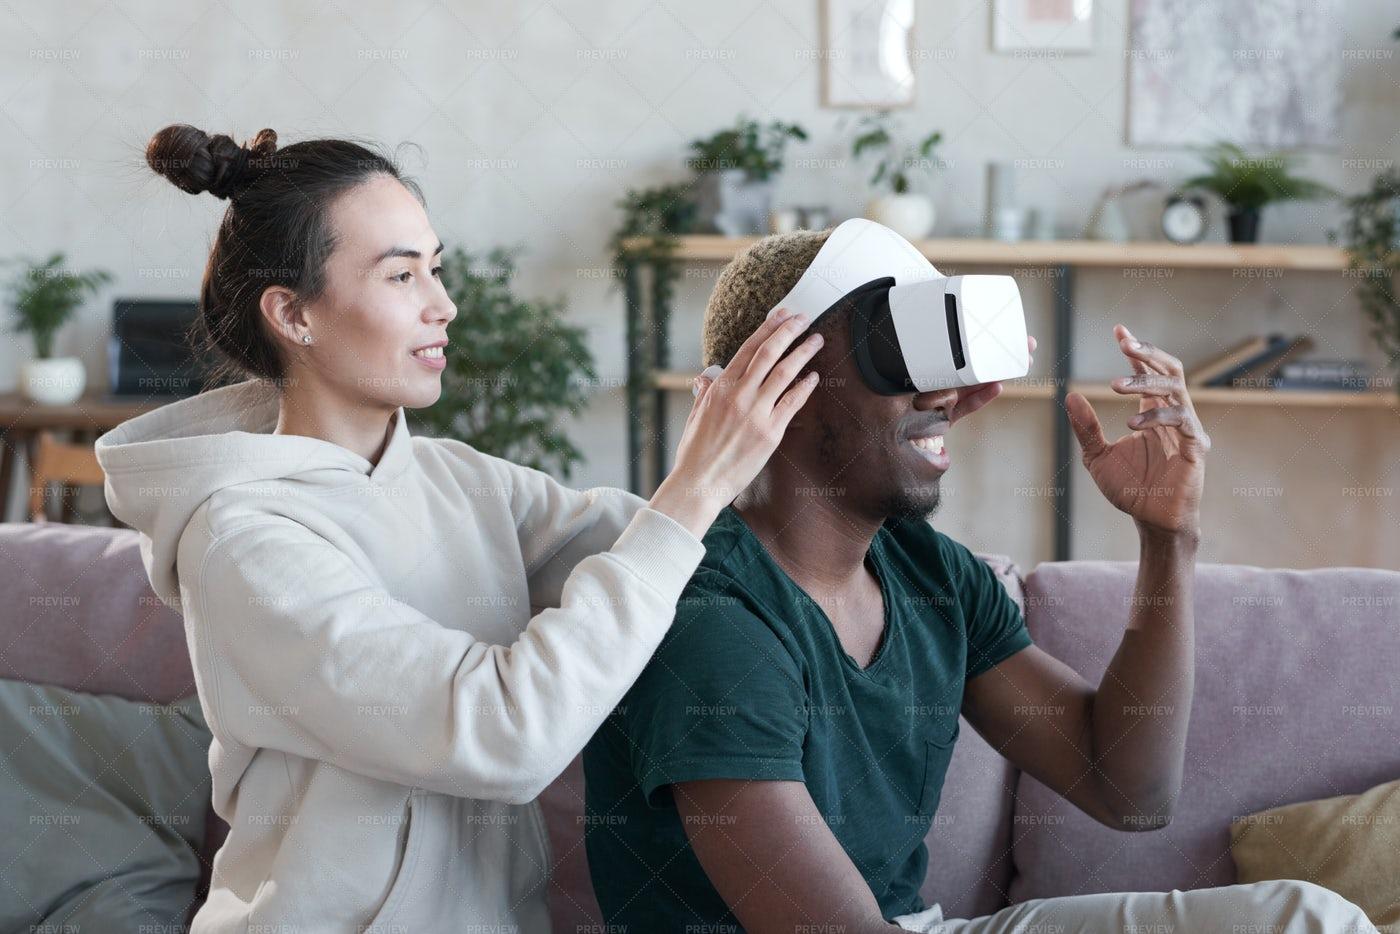 Man Trying Virtual Reality At Home: Stock Photos